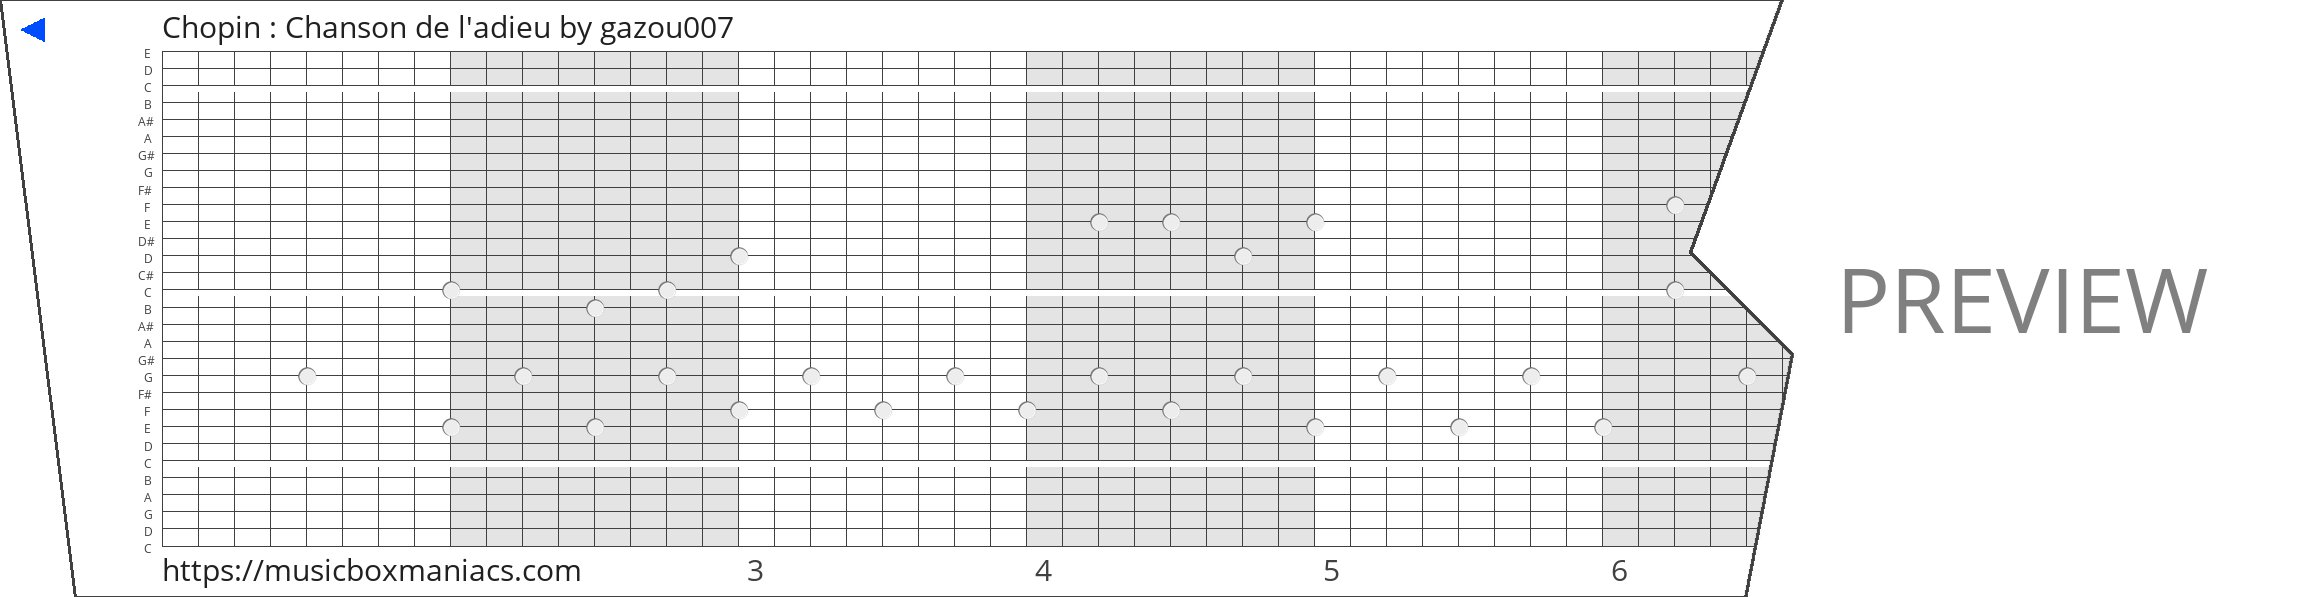 Chopin : Chanson de l'adieu 30 note music box paper strip